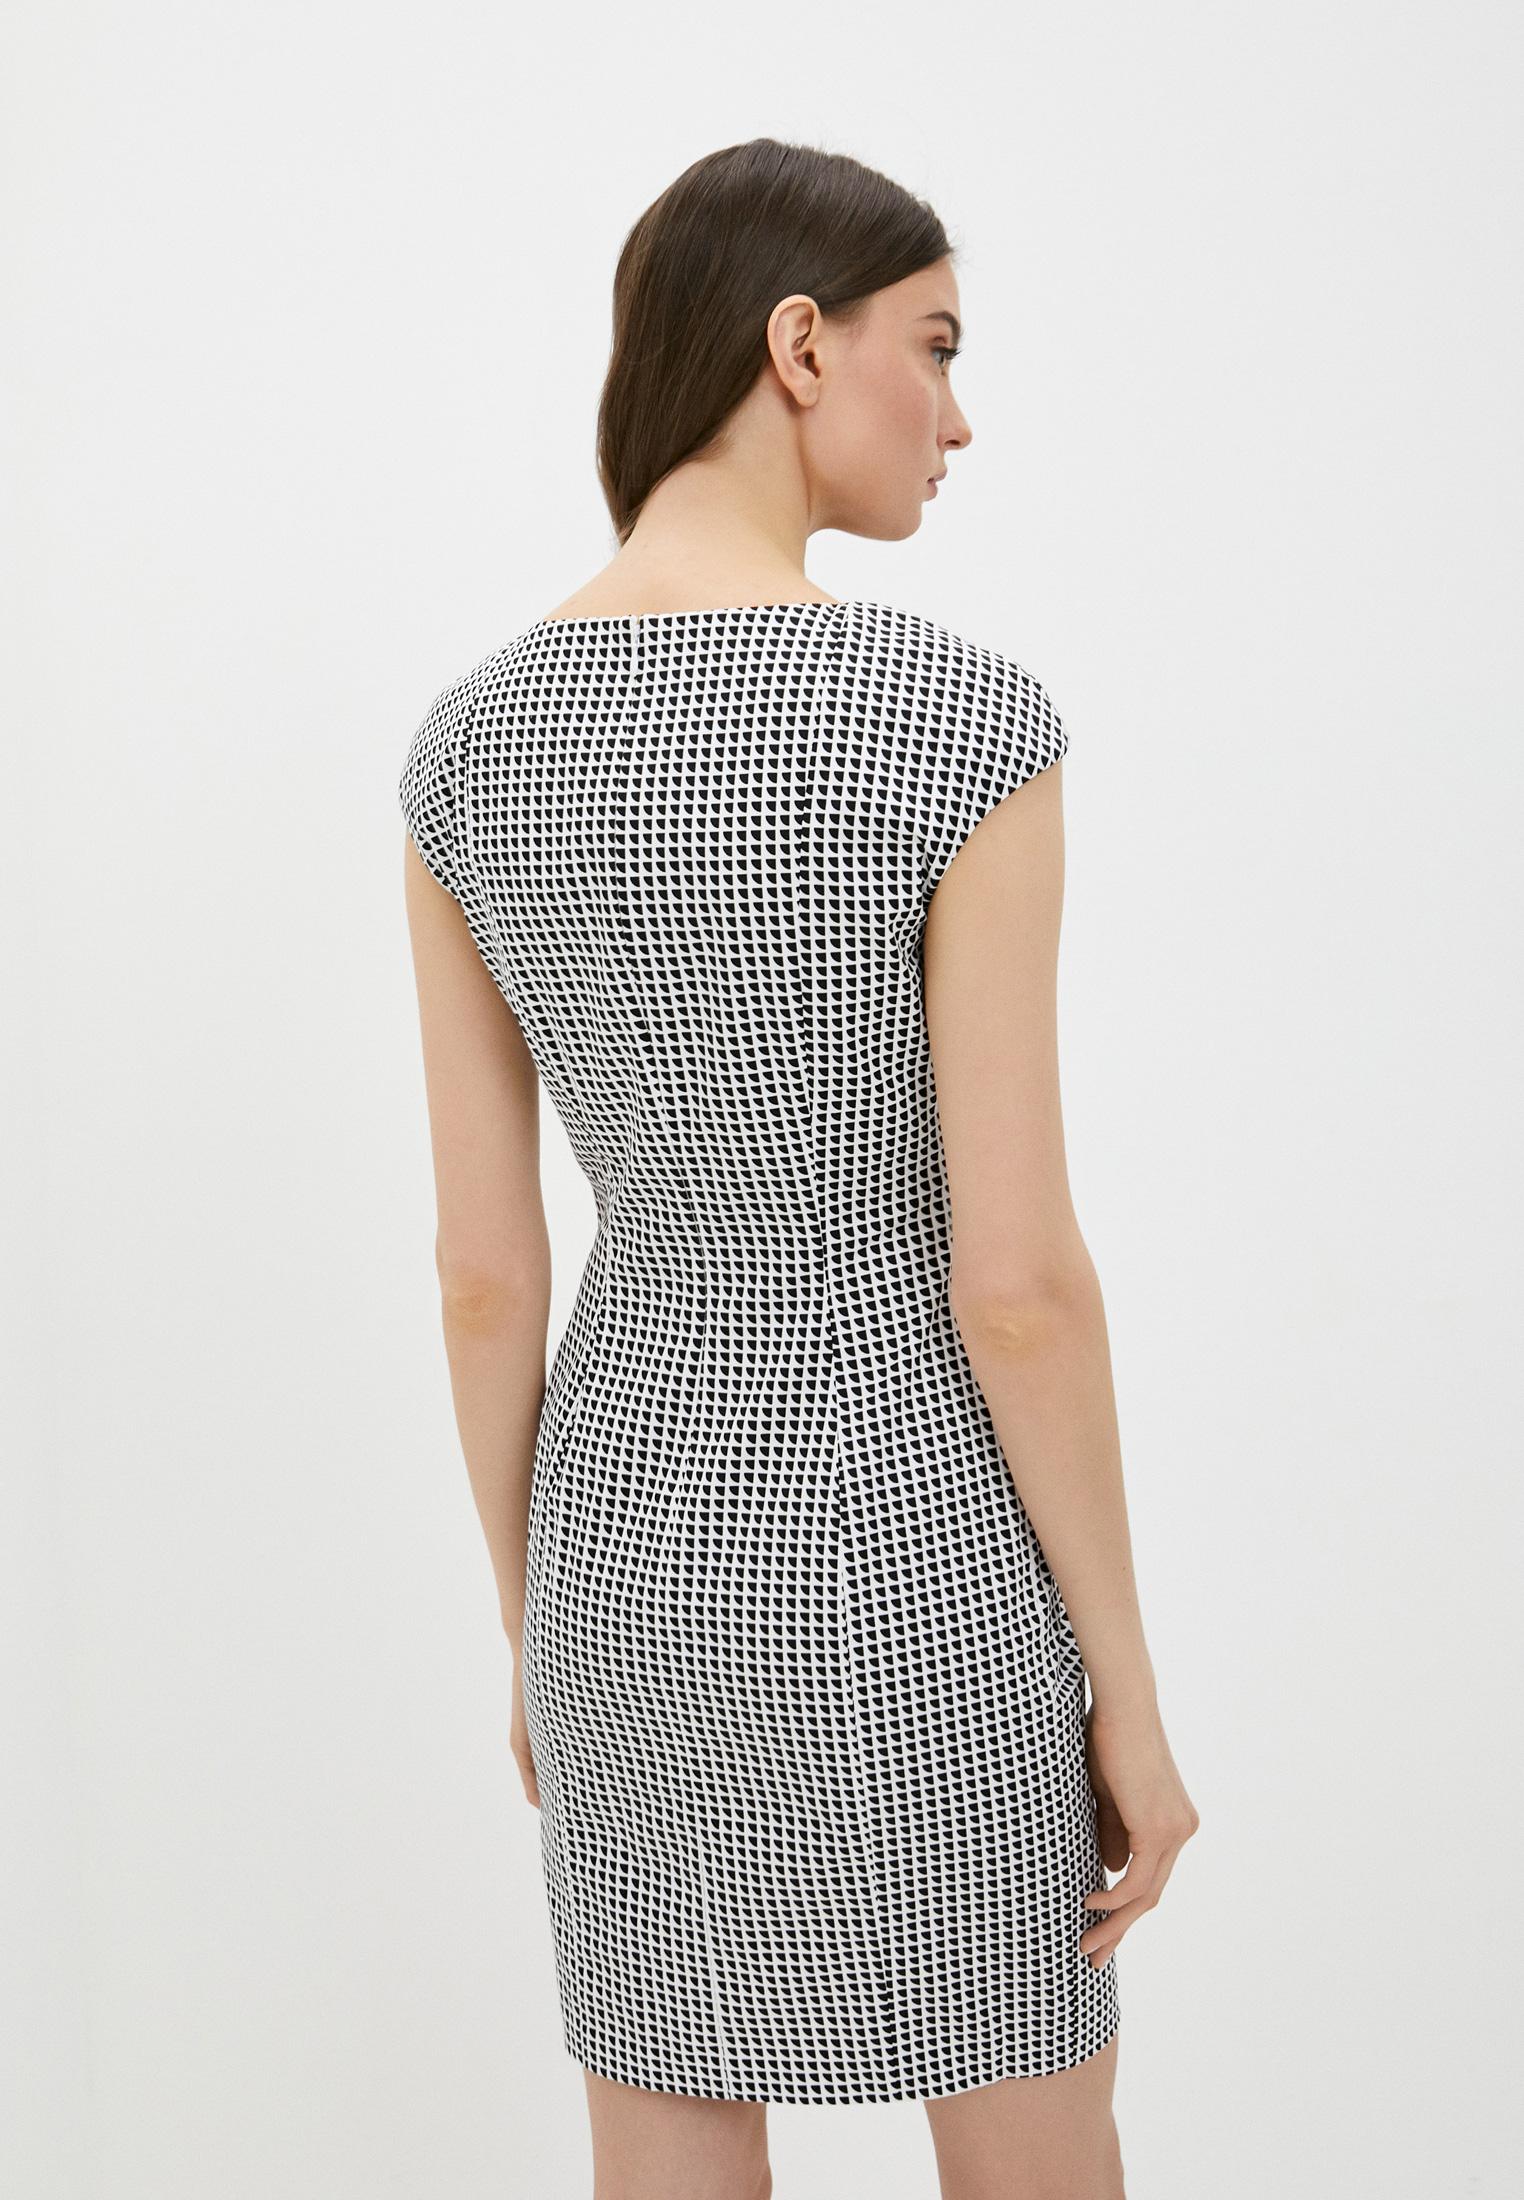 Платье Armani Jeans (Армани Джинс) 75A17UL: изображение 4